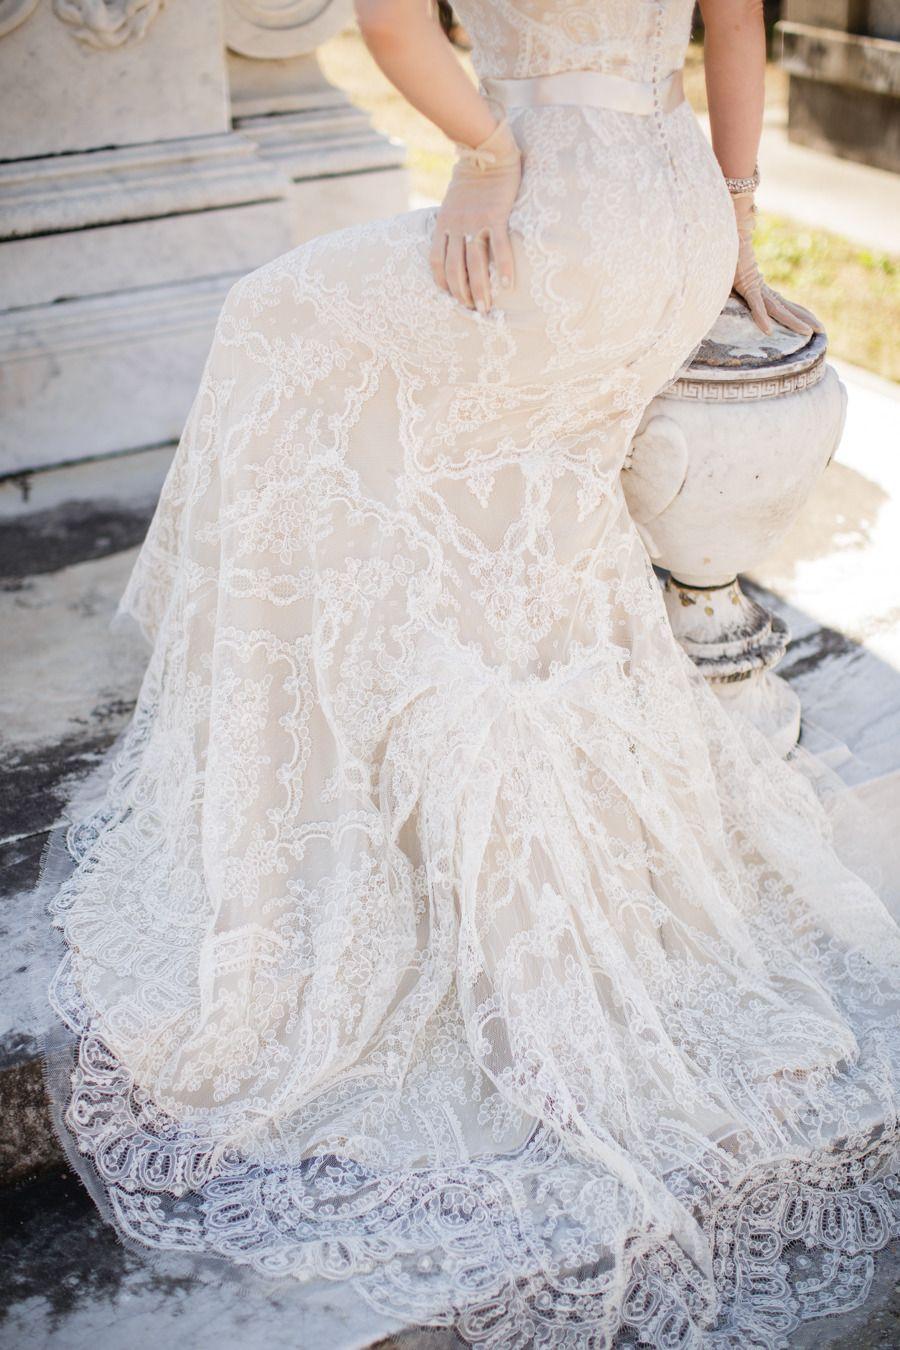 Mardis Gras Inspired New Orleans Wedding Wedding Dress Inspiration Wedding Dresses Bridal Dresses